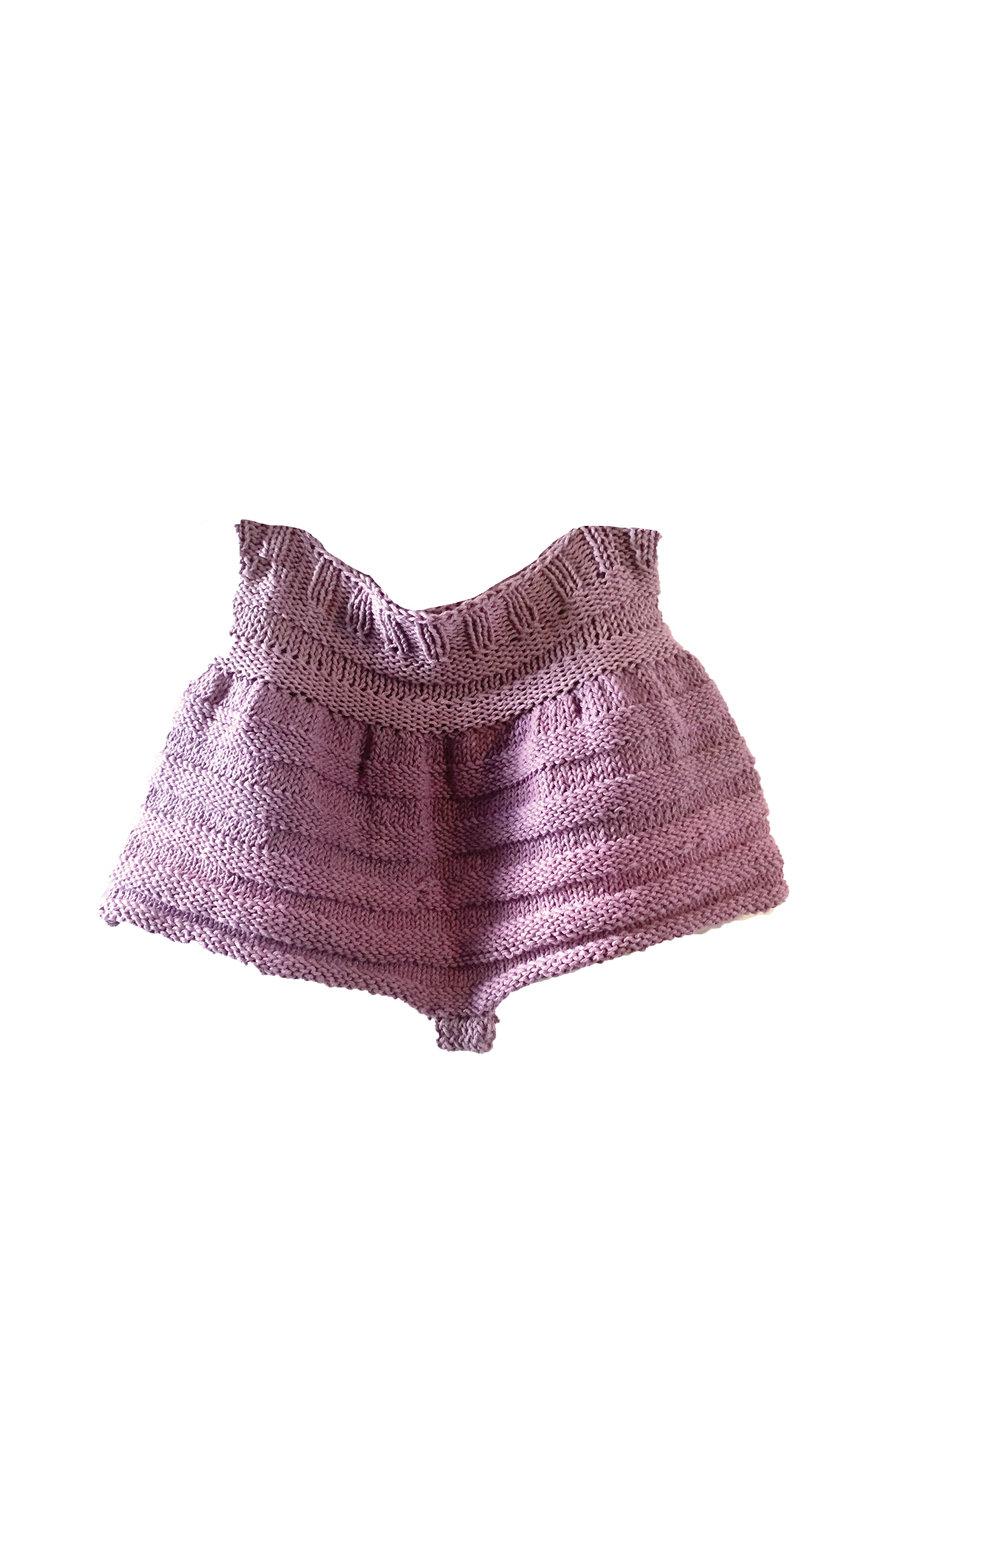 knit_top_and_shorts_DRAFTS8.jpg